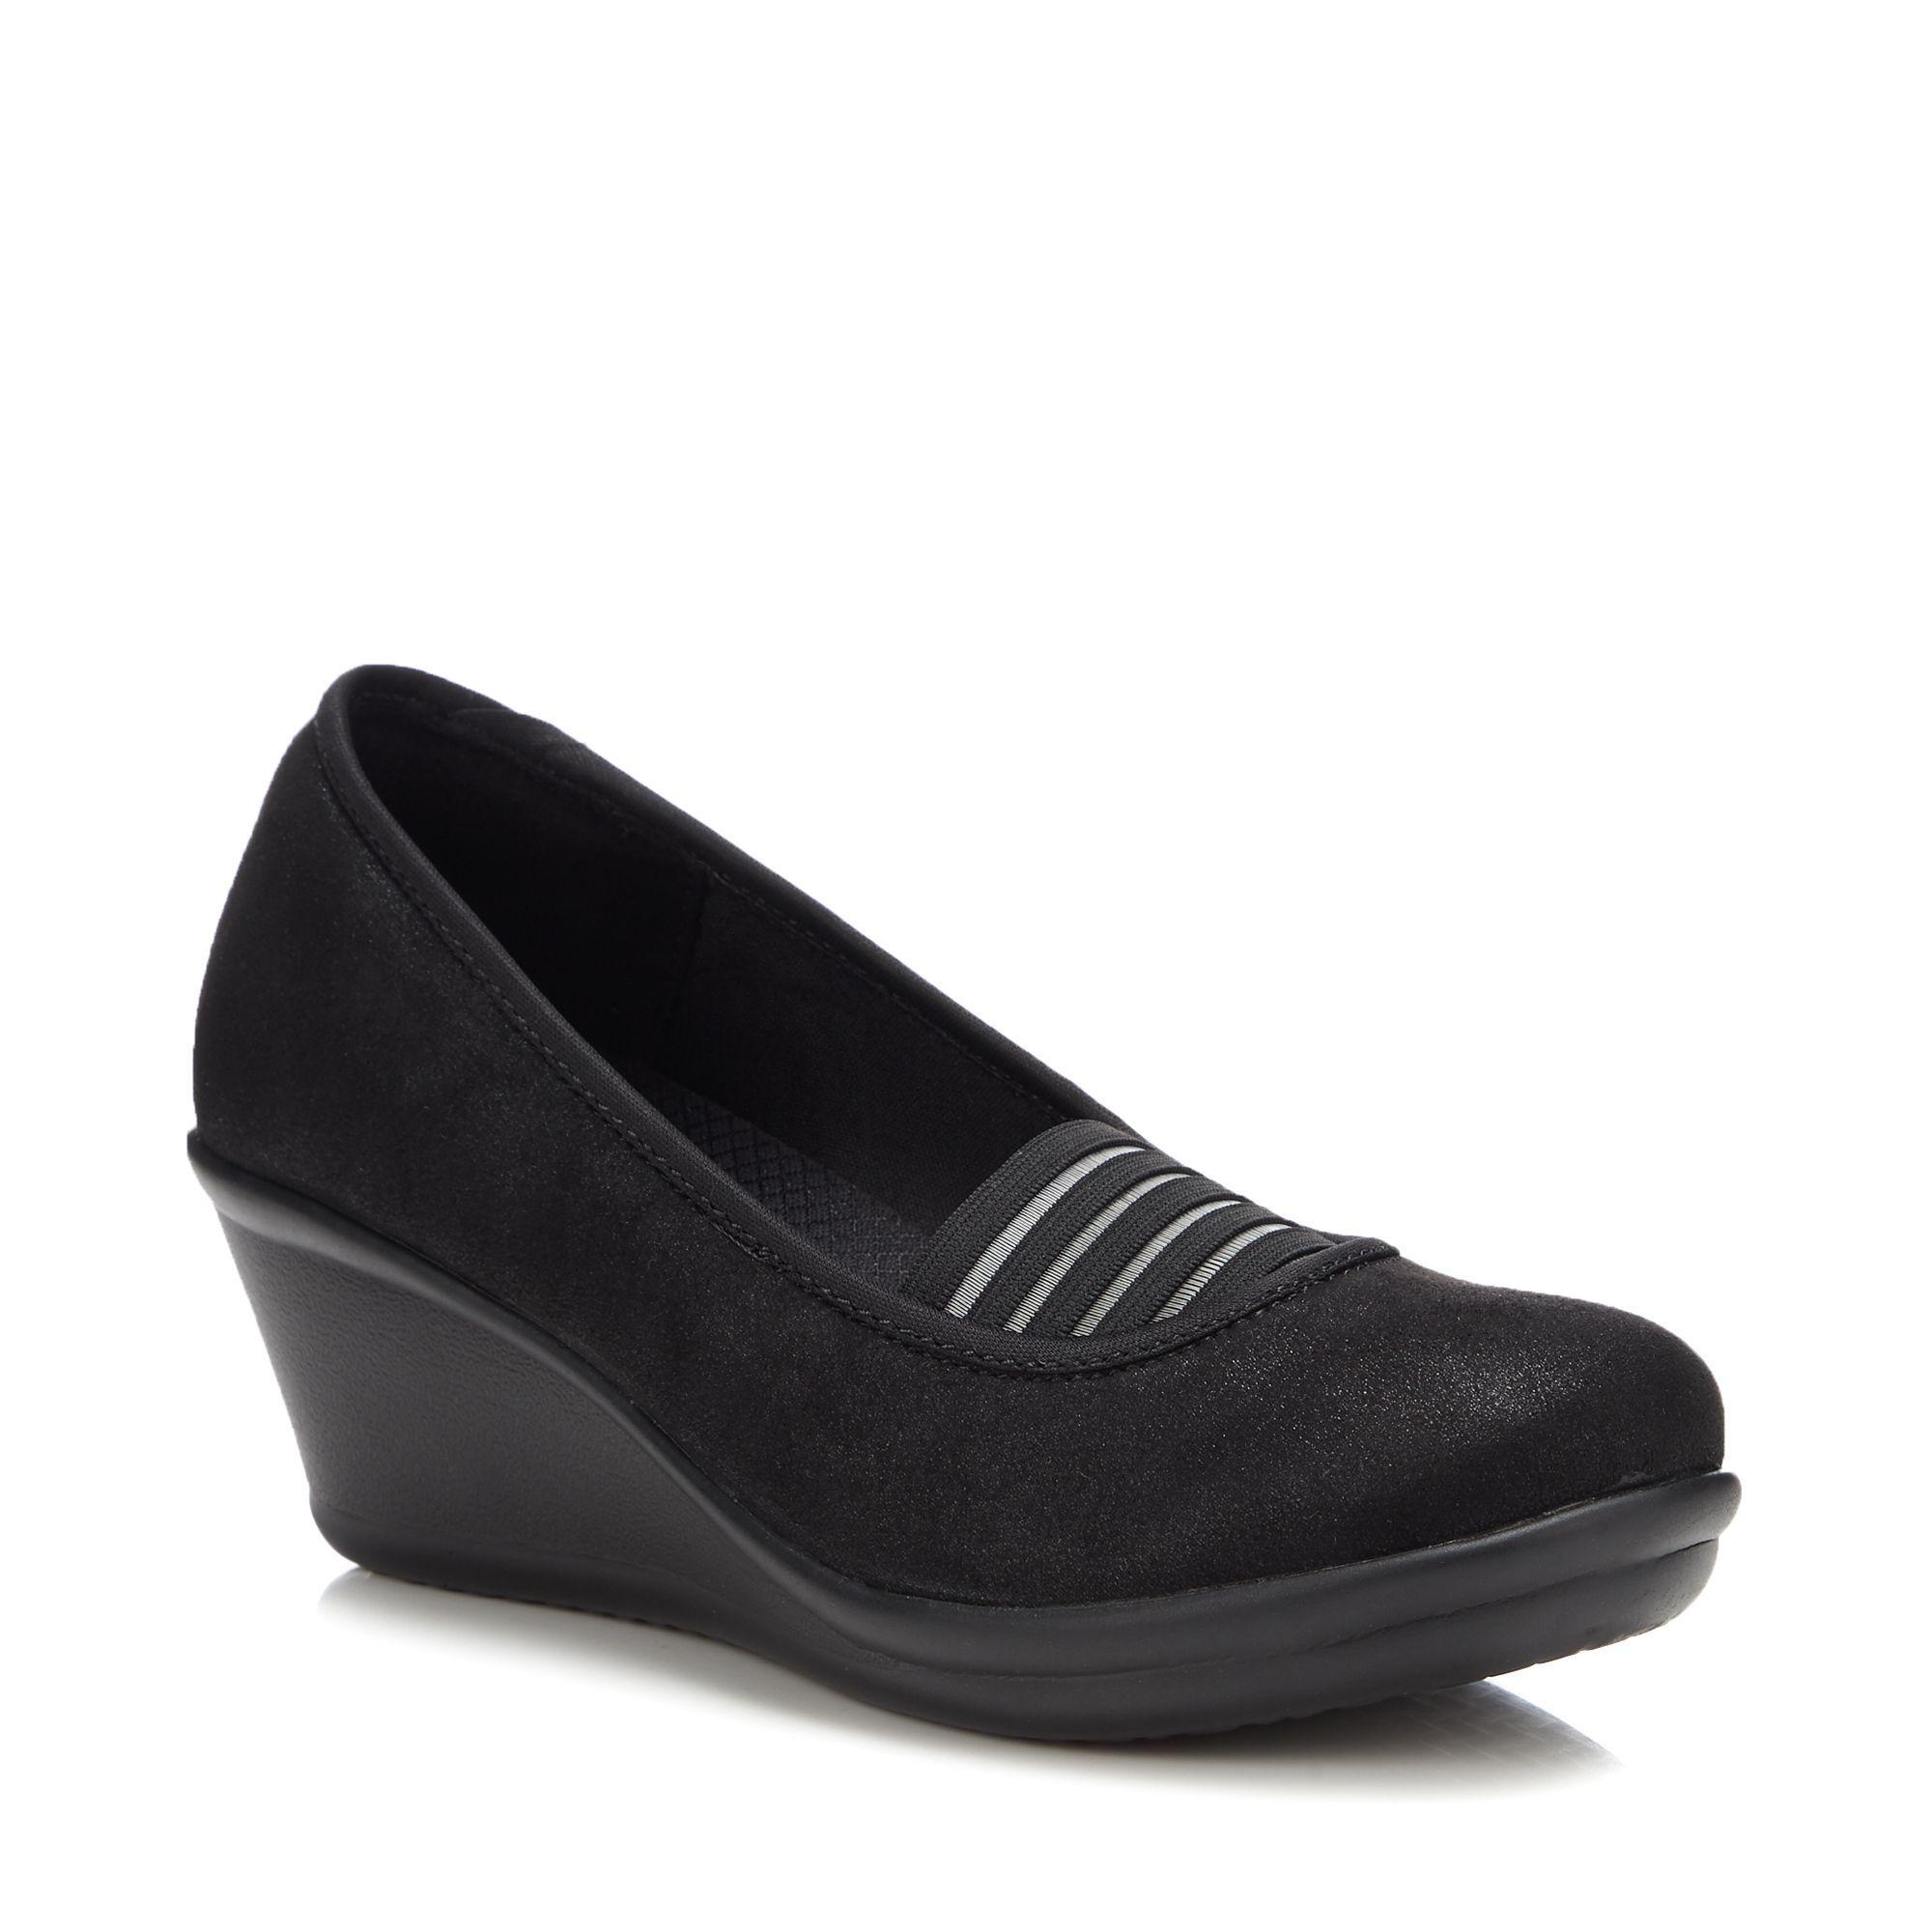 new york new york premium selection 'rumblers Star Loving' Wedge Heel Court Shoes